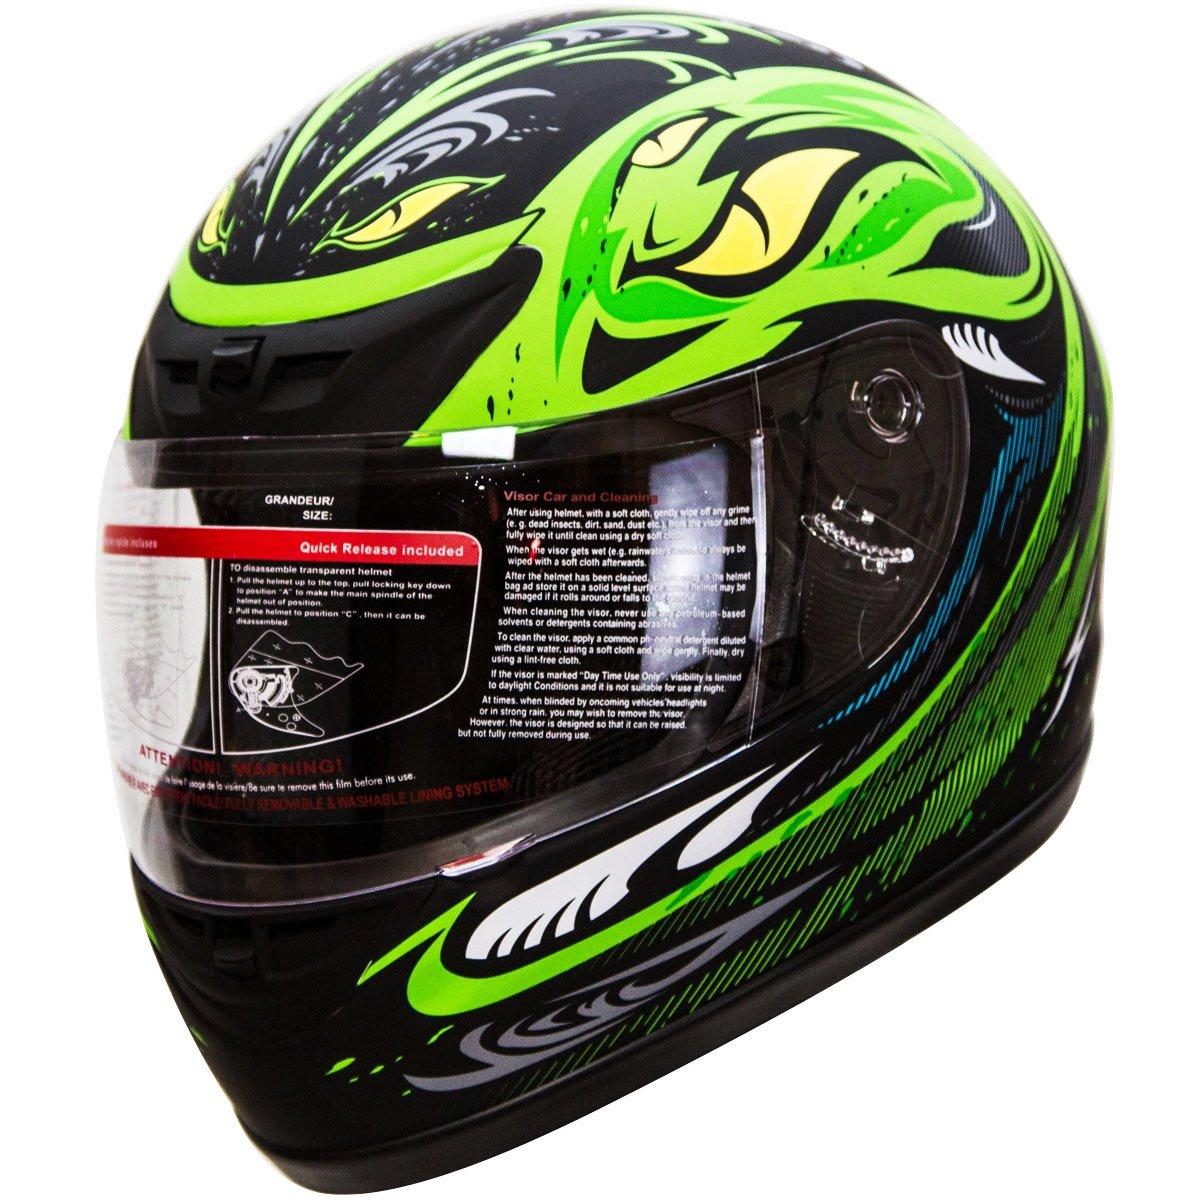 IV2 Serpent Green Full Face Street Bike Motorcycle Helmet [DOT] - Medium